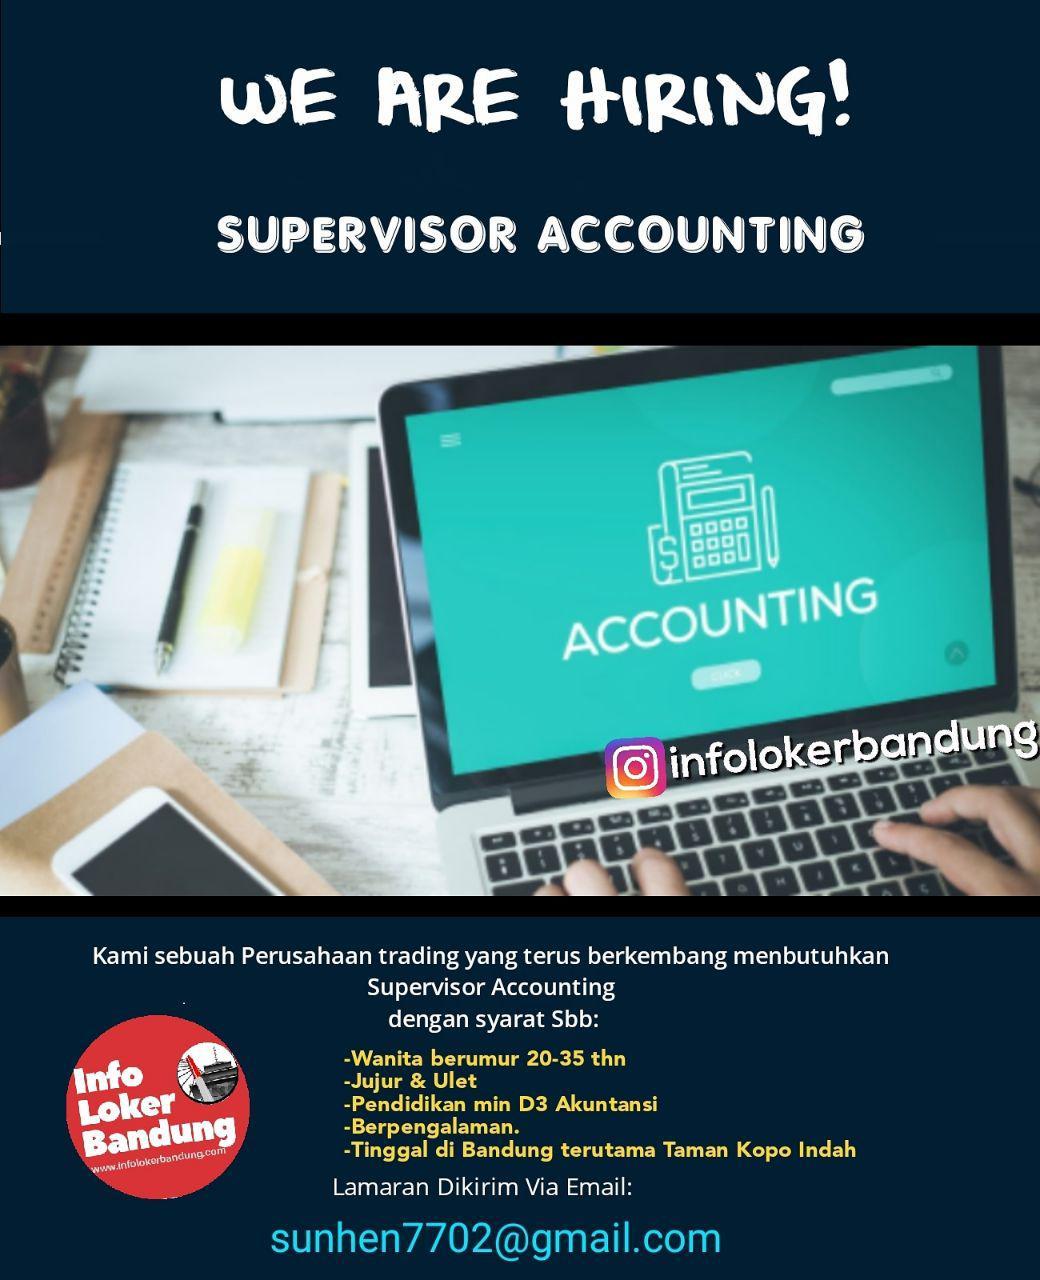 Lowongan Kerja Supervisor Accounting Perusahaan Trading Bandung Februari 2019